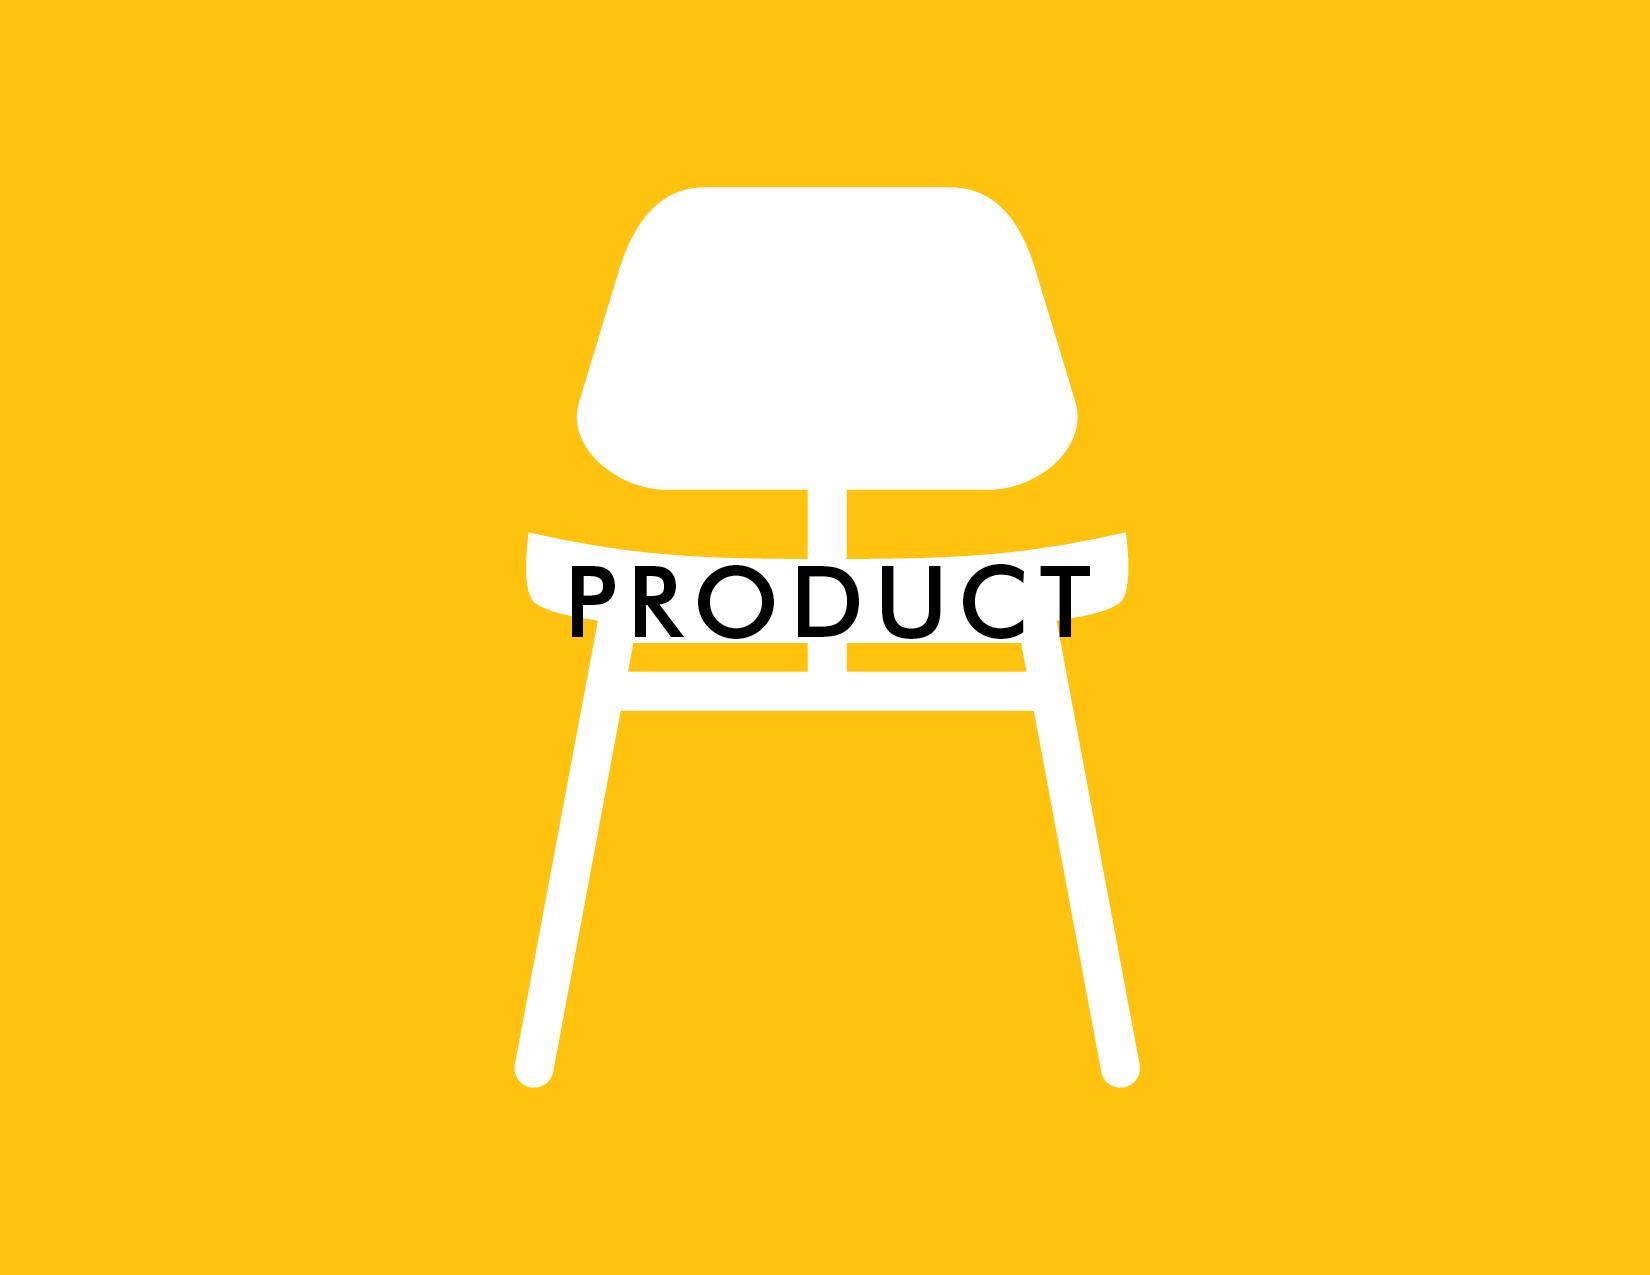 2016 FALL PRODUCT DESIGN AWARD HEADQUARTERS